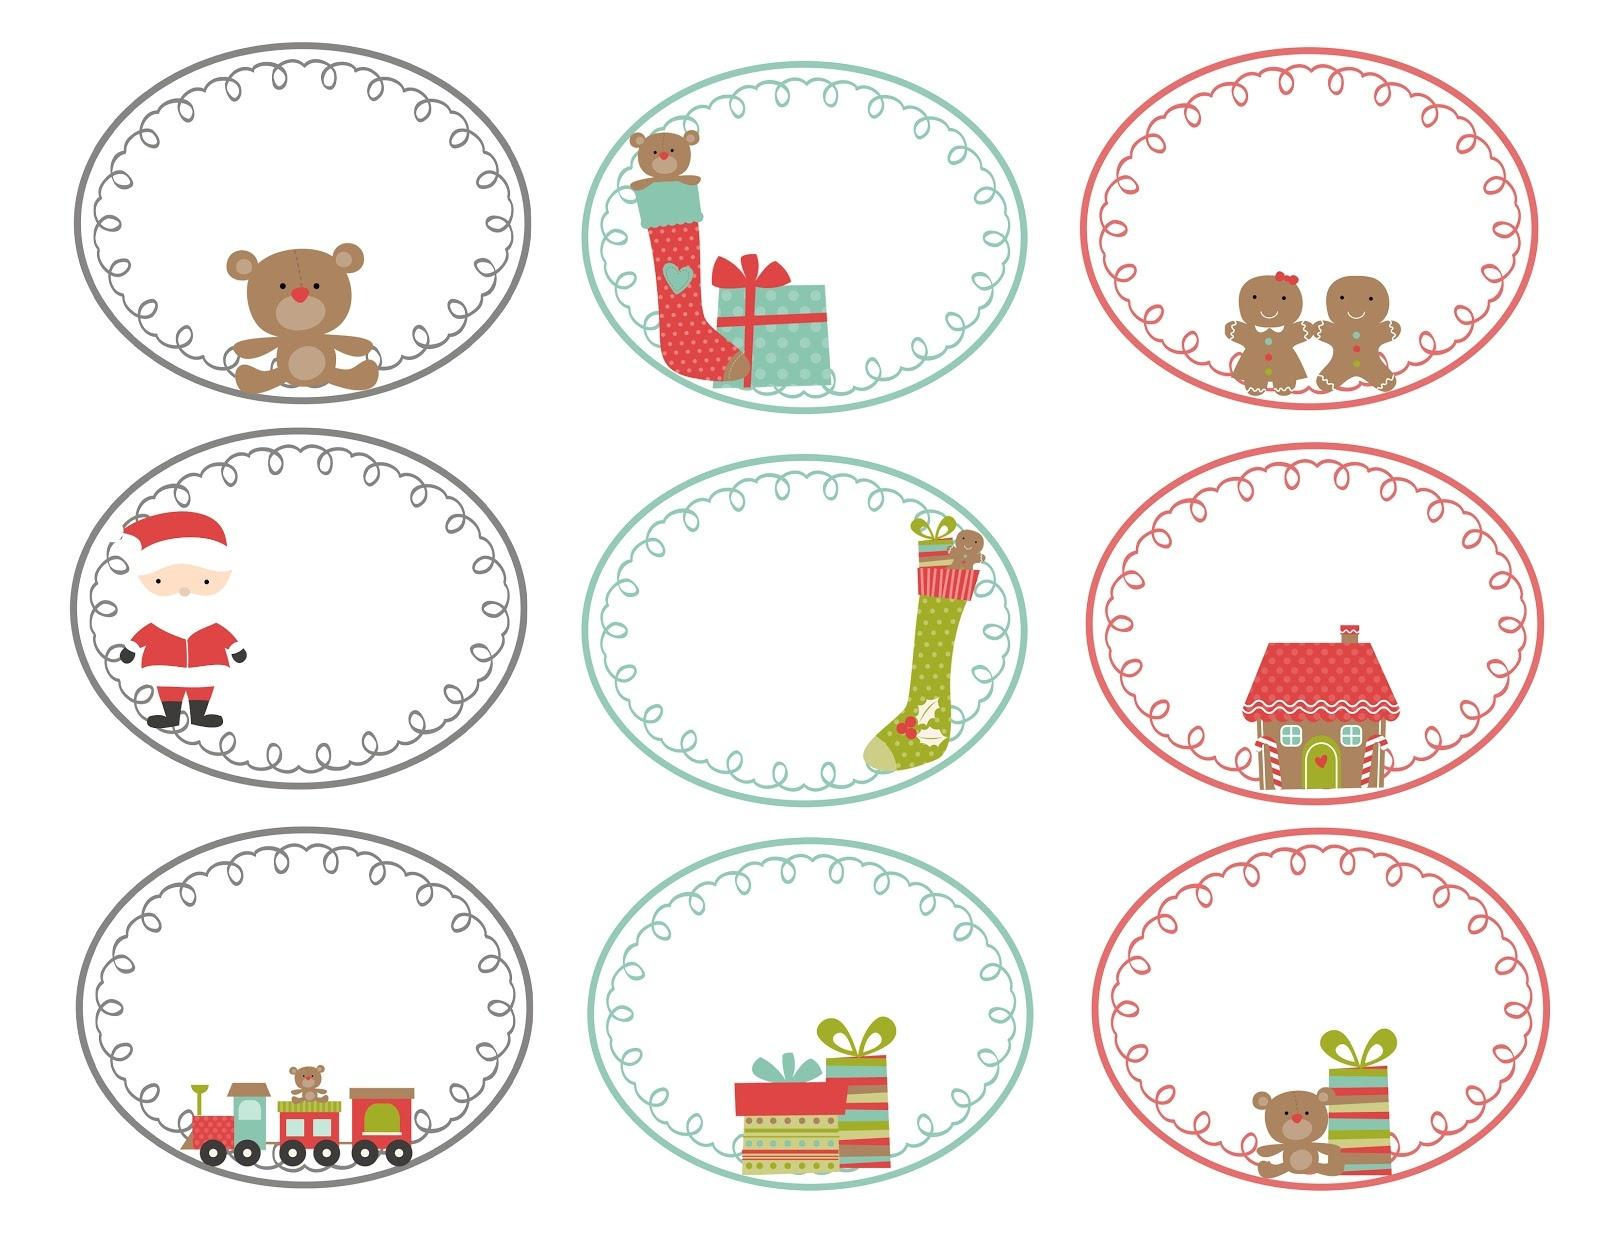 Homemade Christmas Gift Tags Templates - Demir.iso-Consulting.co - Free Printable Christmas Tags Templates